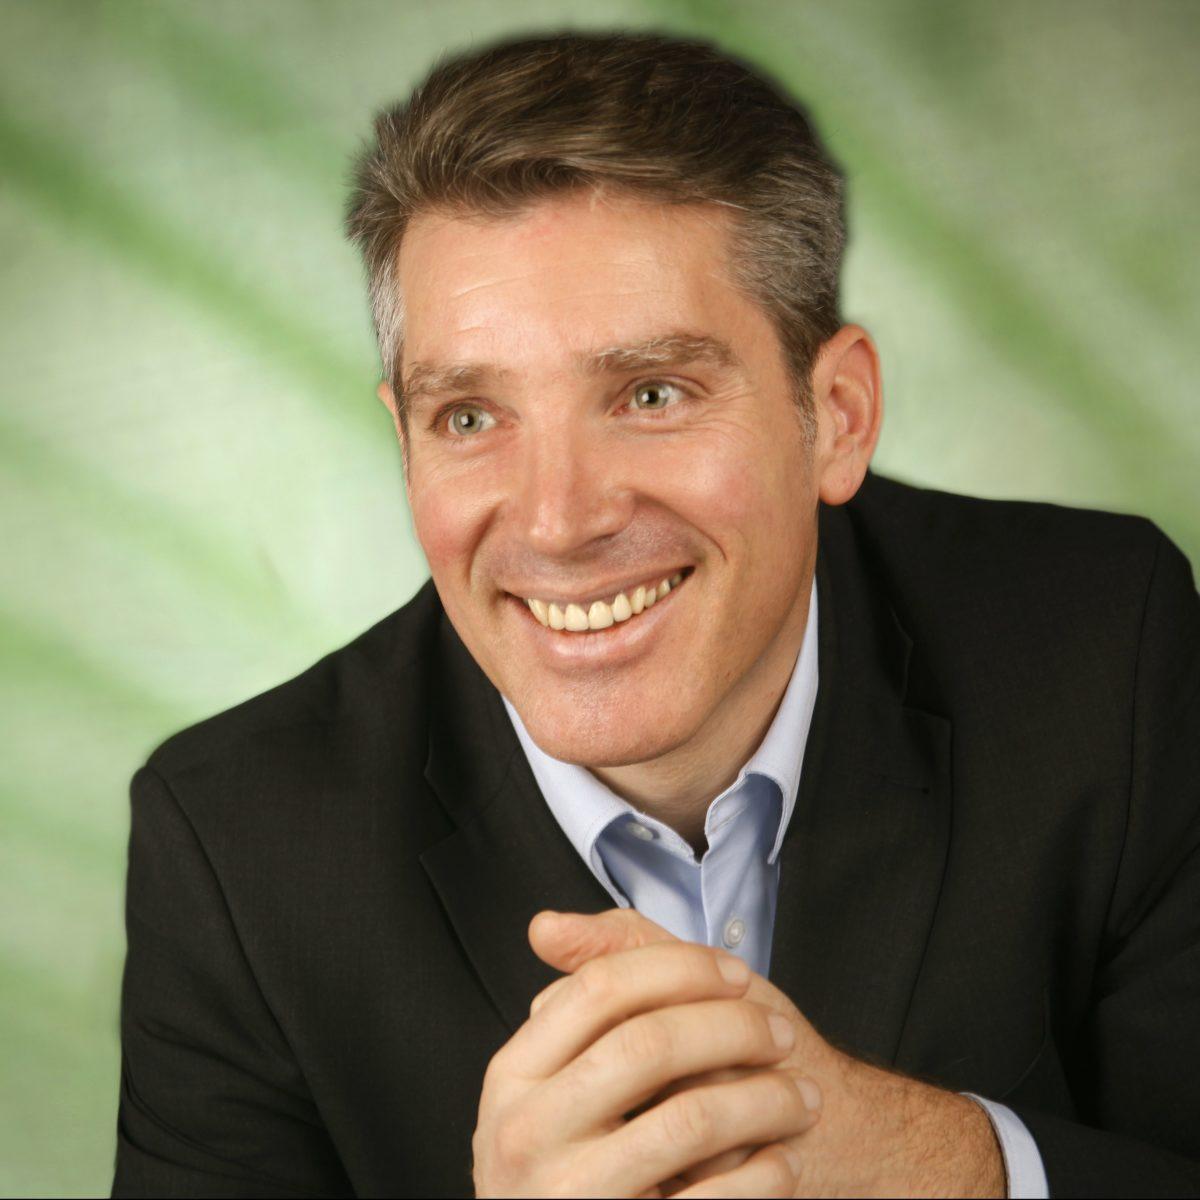 Markus Gruber, CEO of SELMO